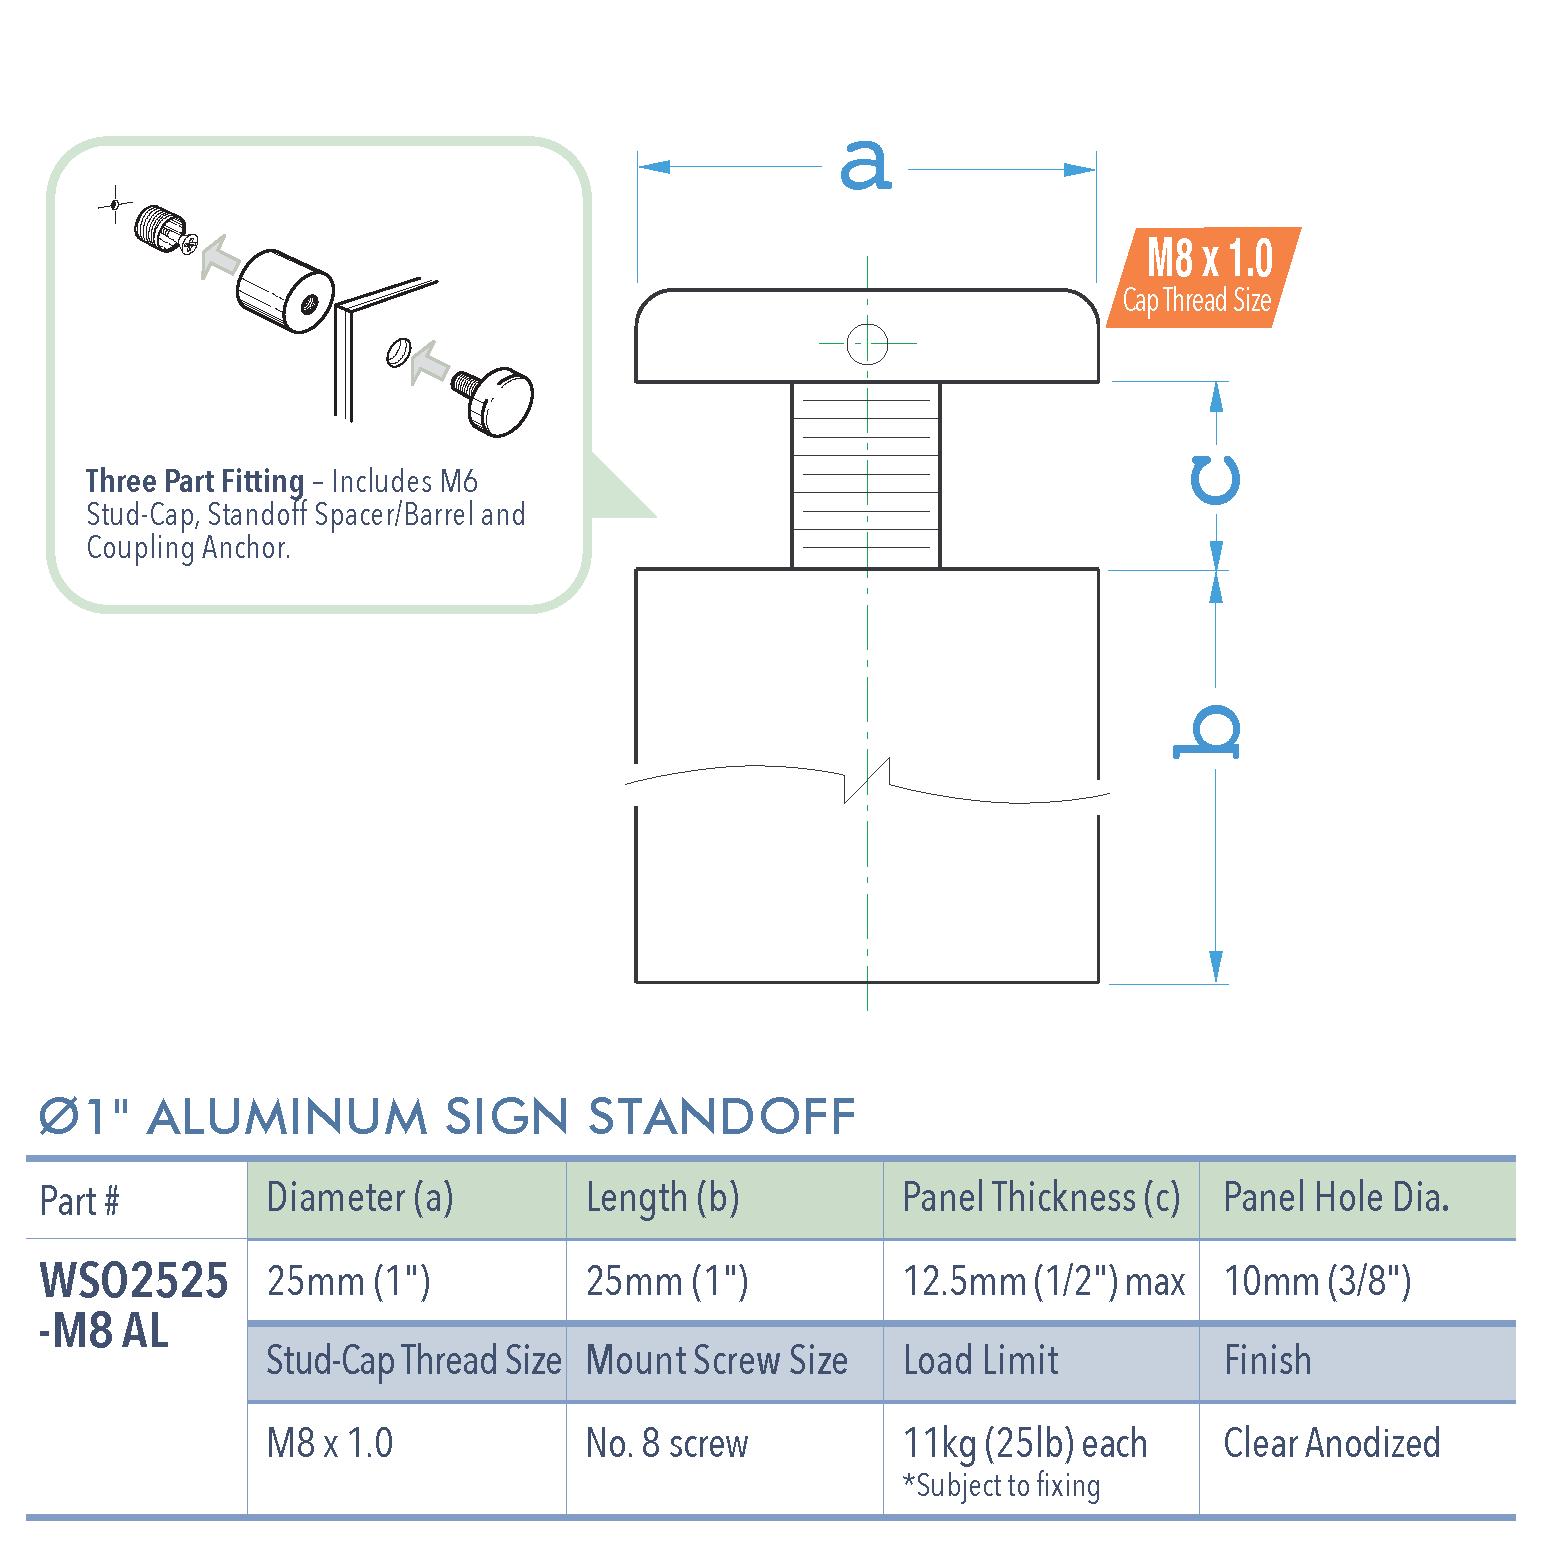 Specifications for WSO2525-M8 AL